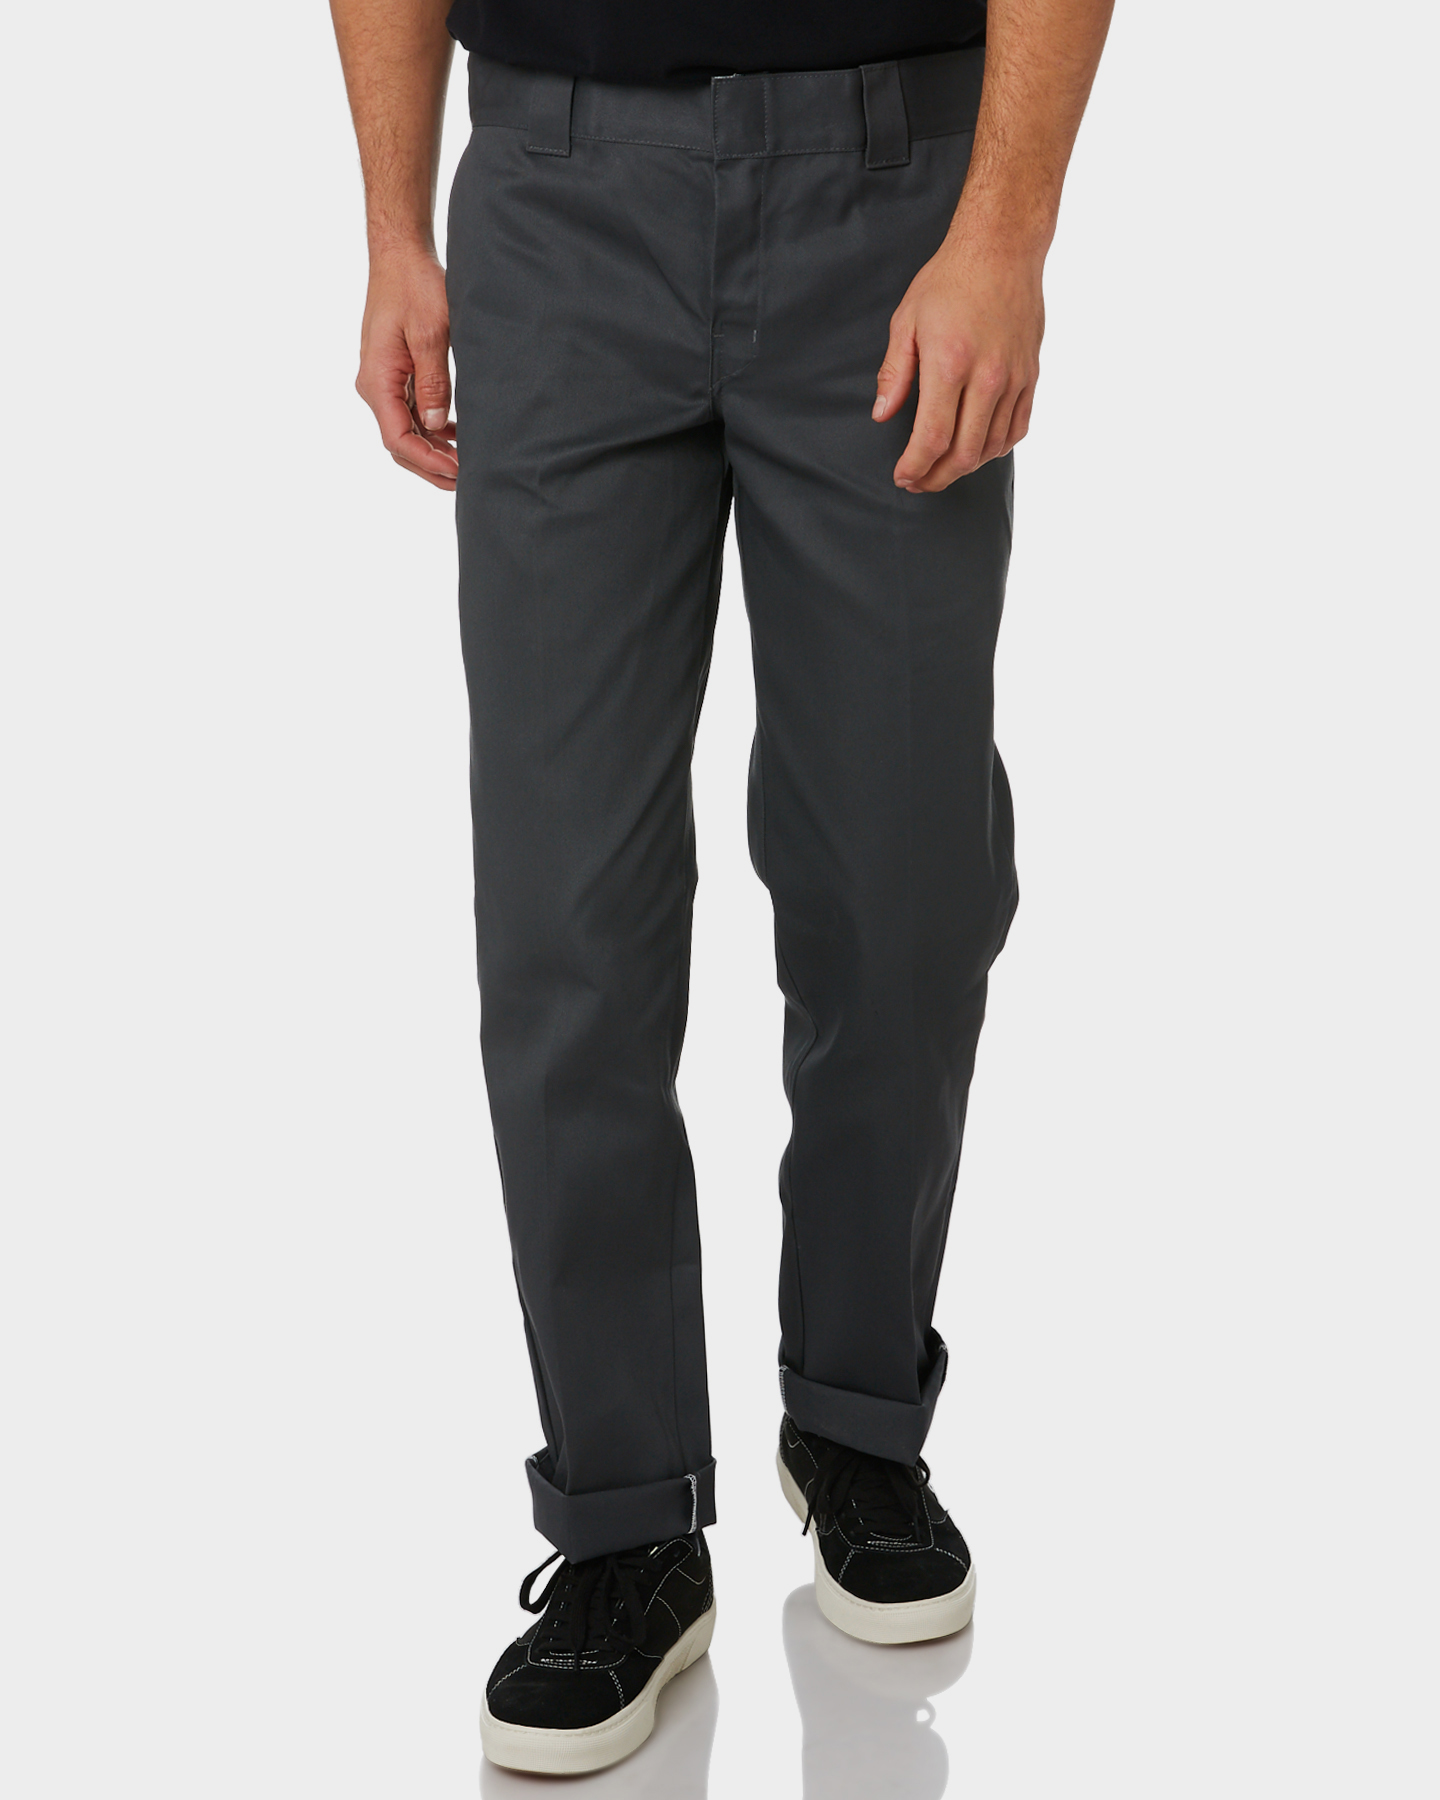 53854768de4b46 New Dickies Men's 873 Slimmer Straight Fit Work Pant Cotton .